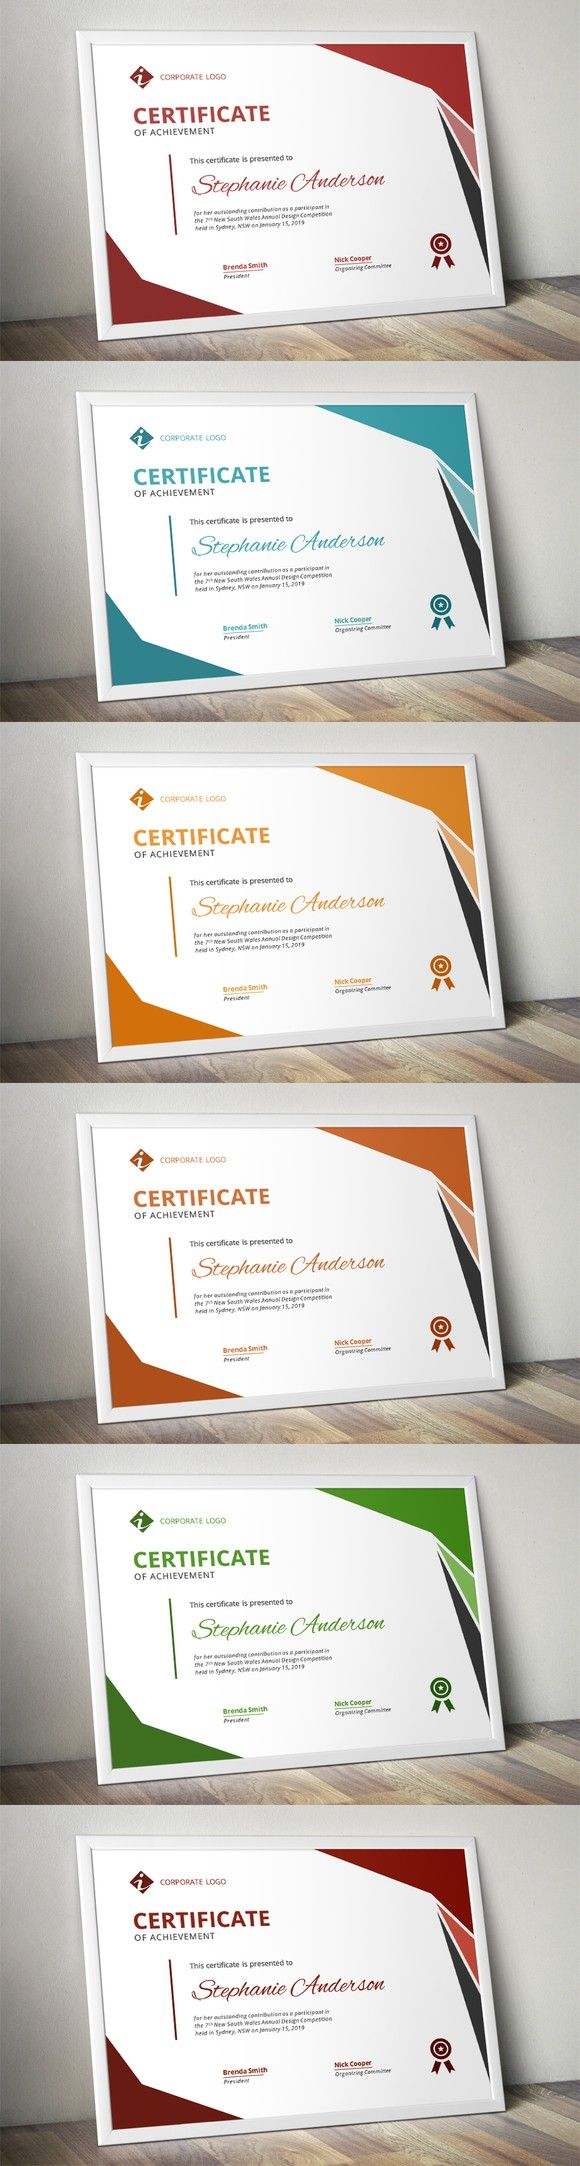 Modern MS Word certificate design   Zertifikat, Zertifikat design ...